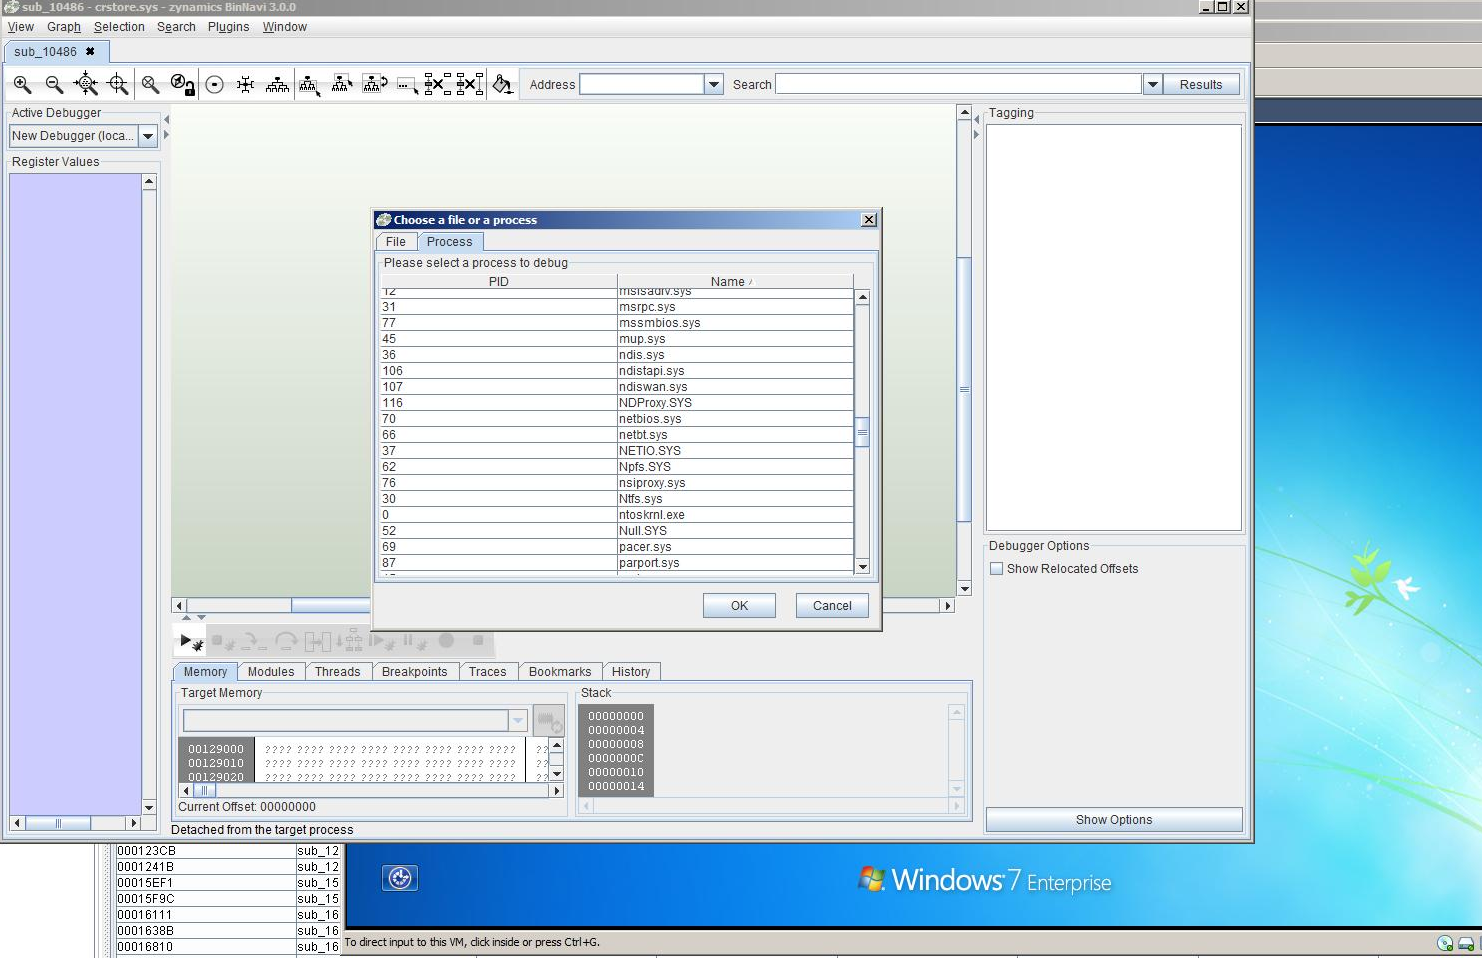 mrxsmb.sys Windows Prozess - Was ist das? - file.net